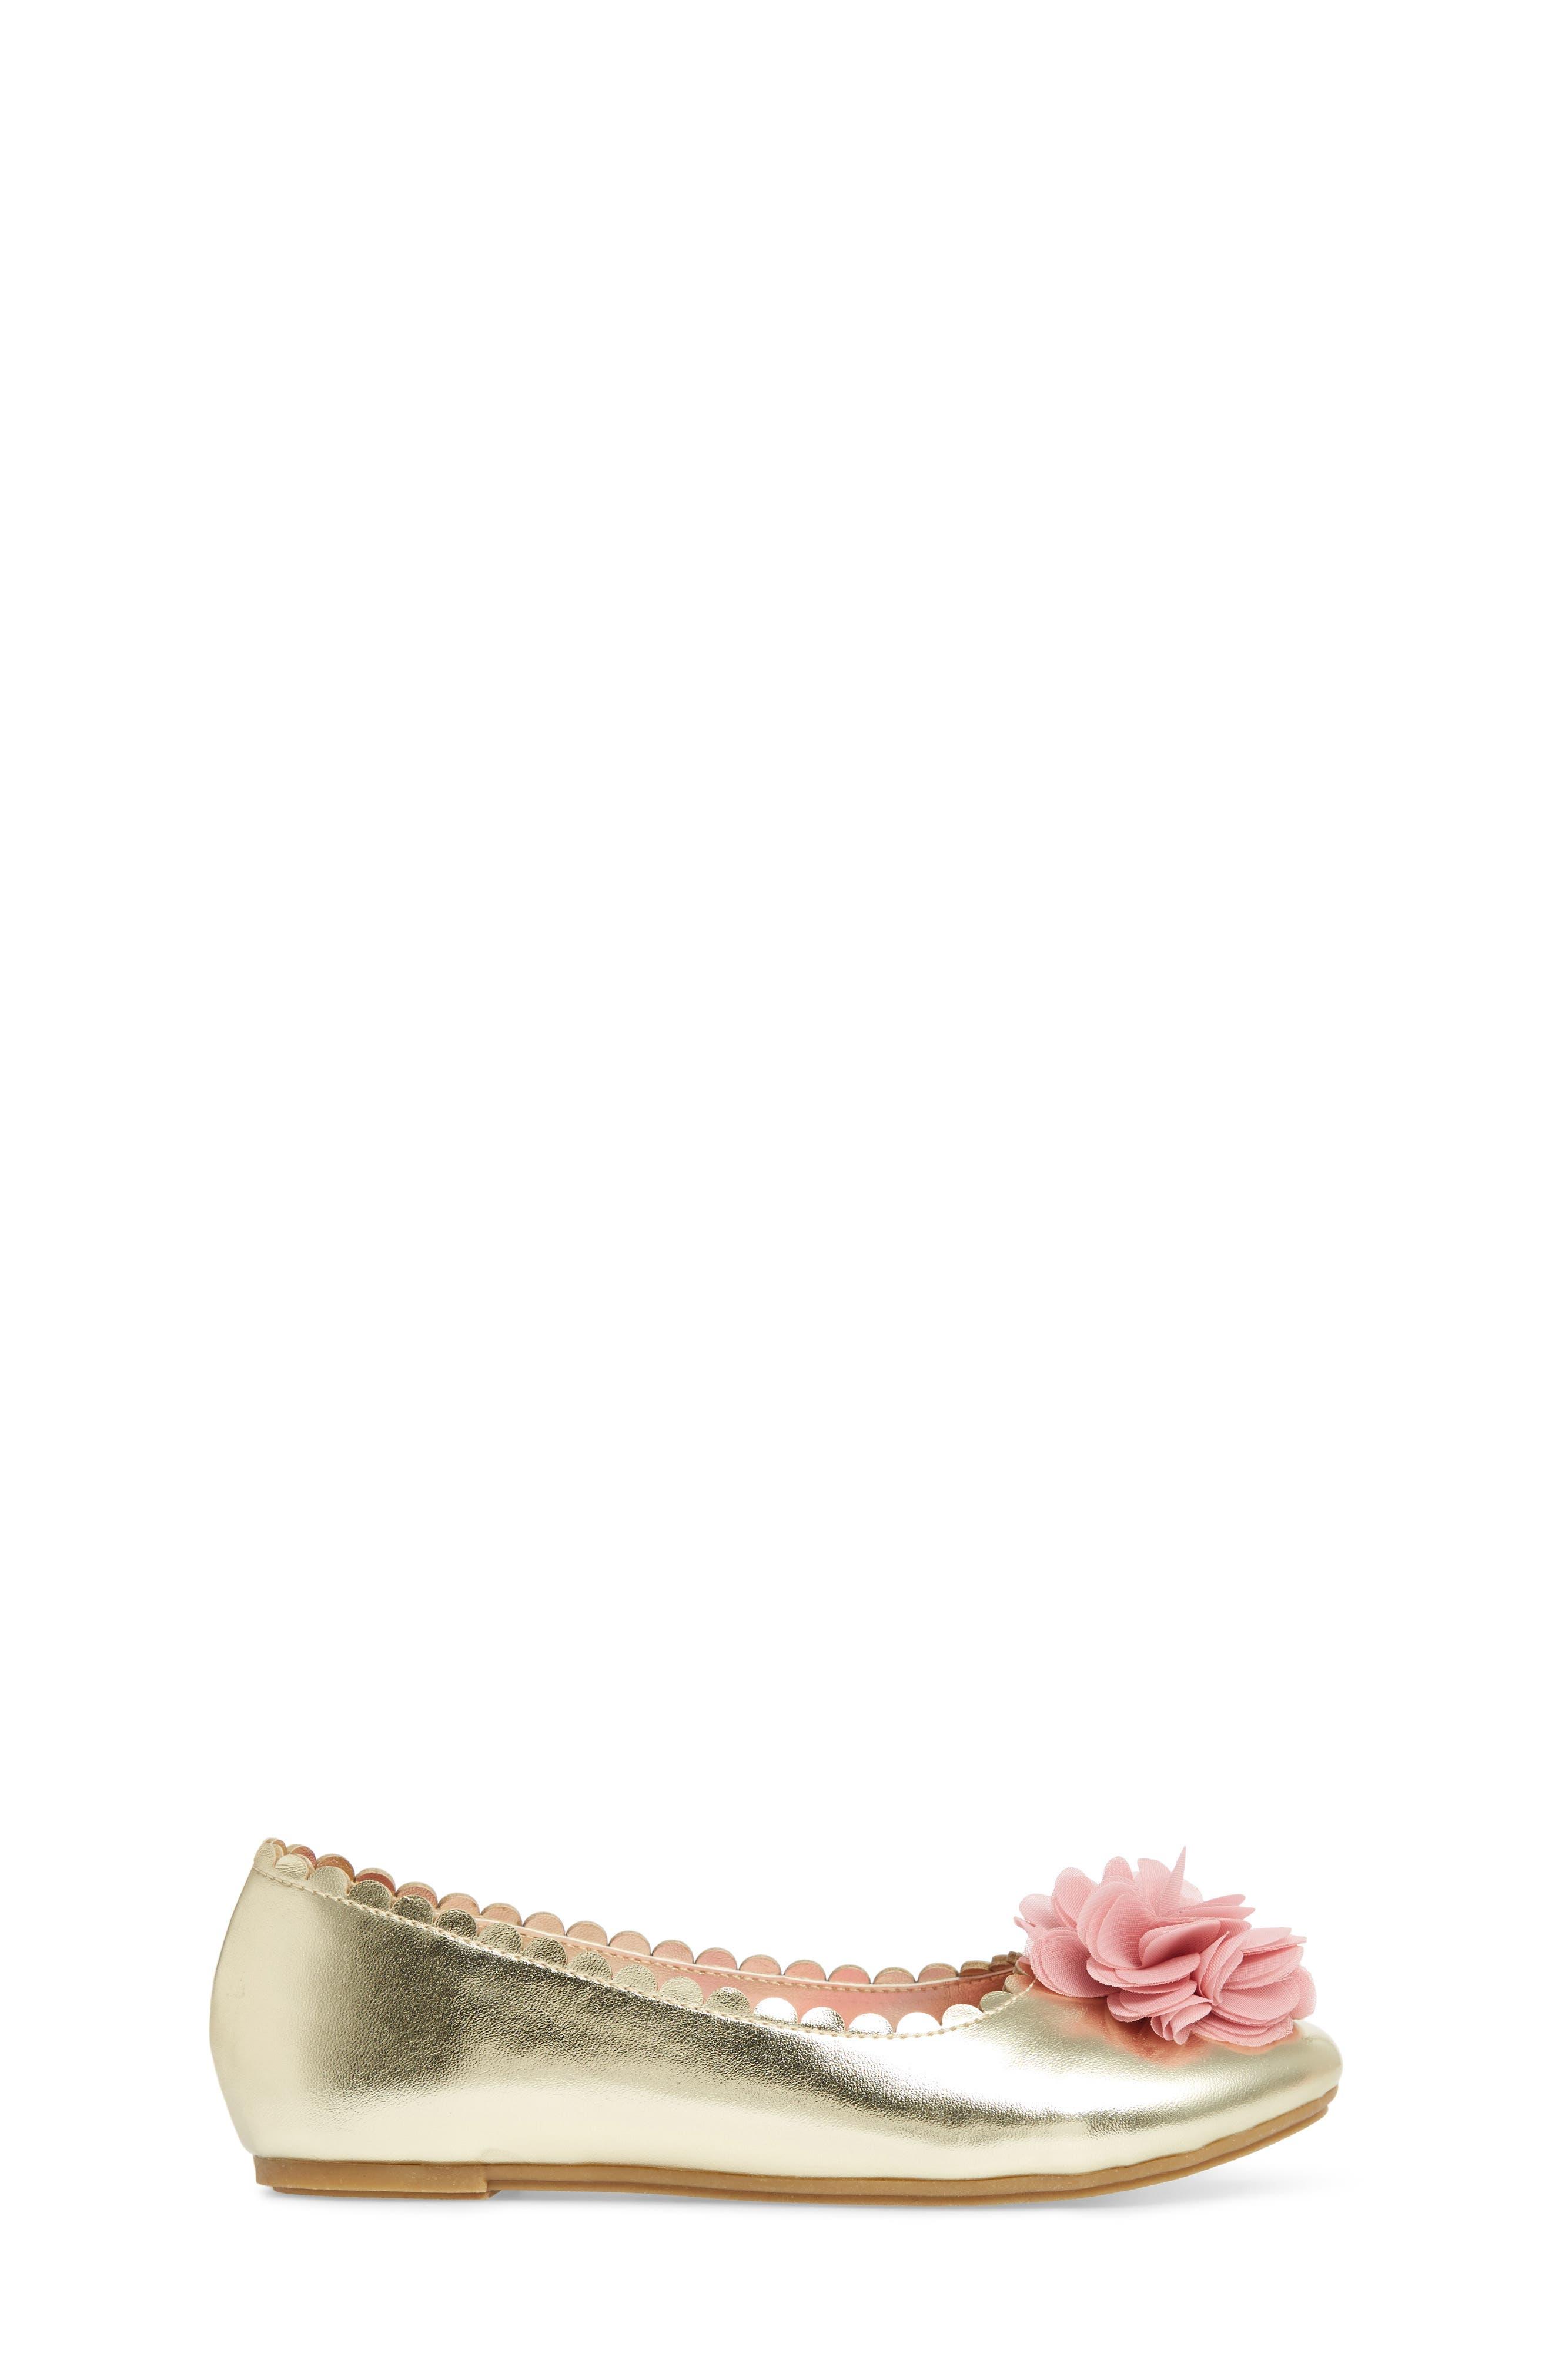 Alternate Image 3  - WellieWishers from American Girl Ashlyn Flower Ballet Flat (Toddler, Little Kid & Big Kid)